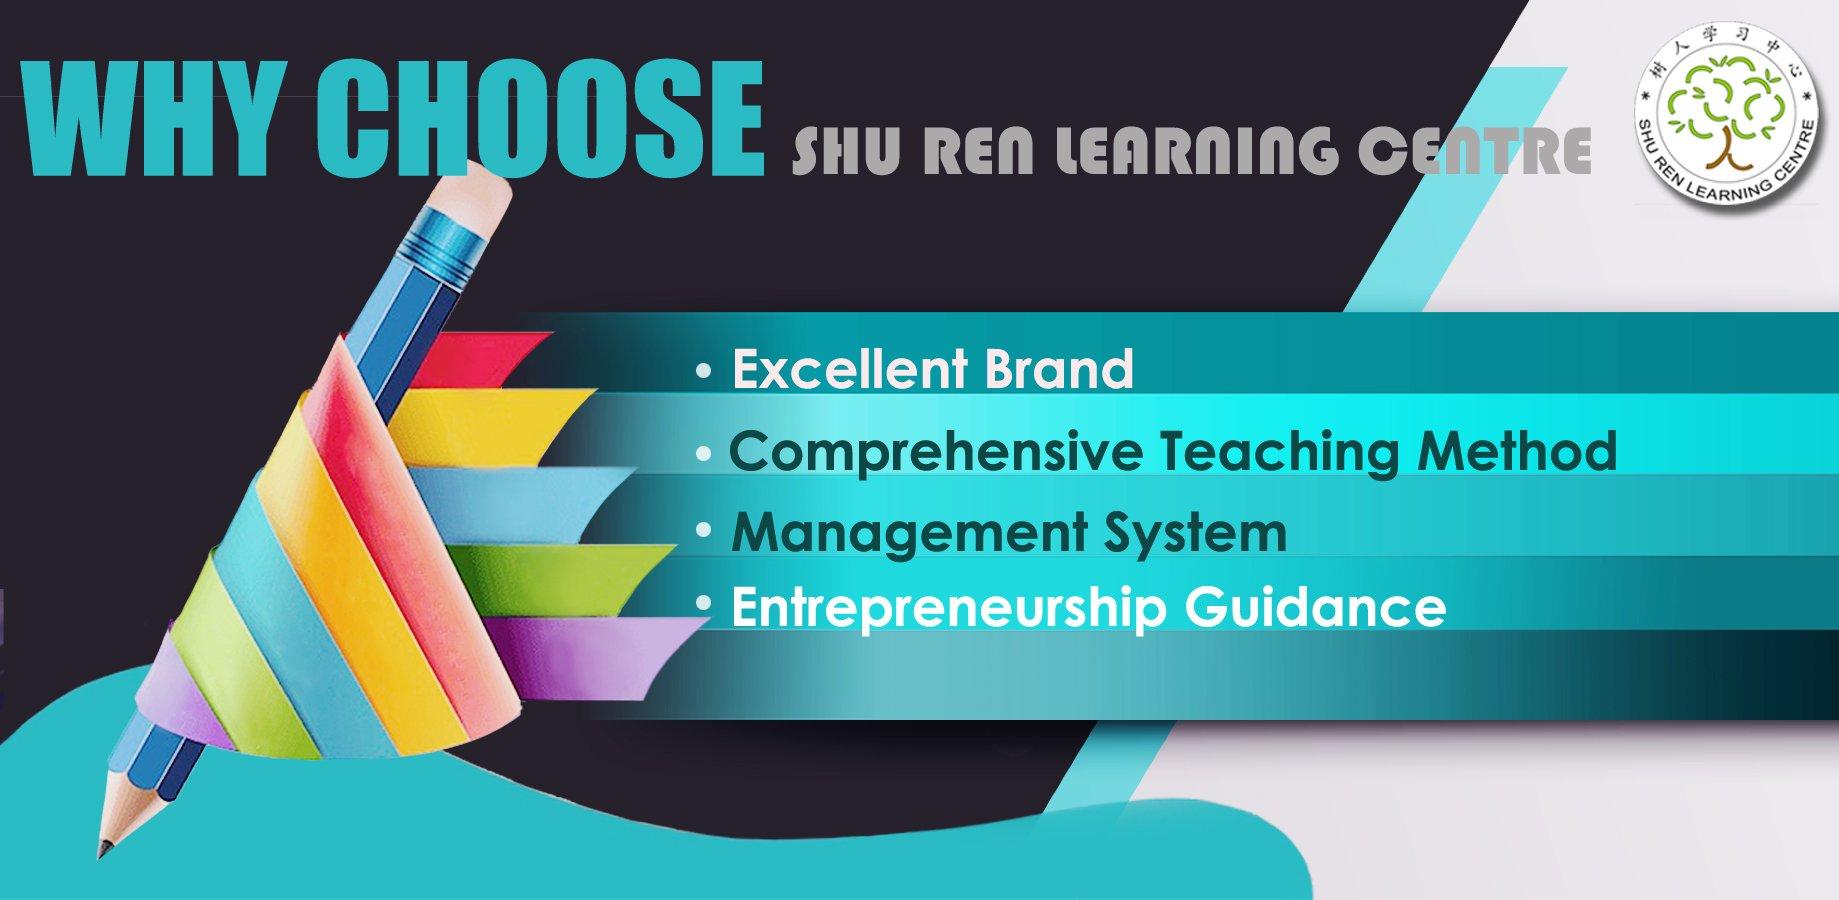 Shuren Teaching Team-website7 phone